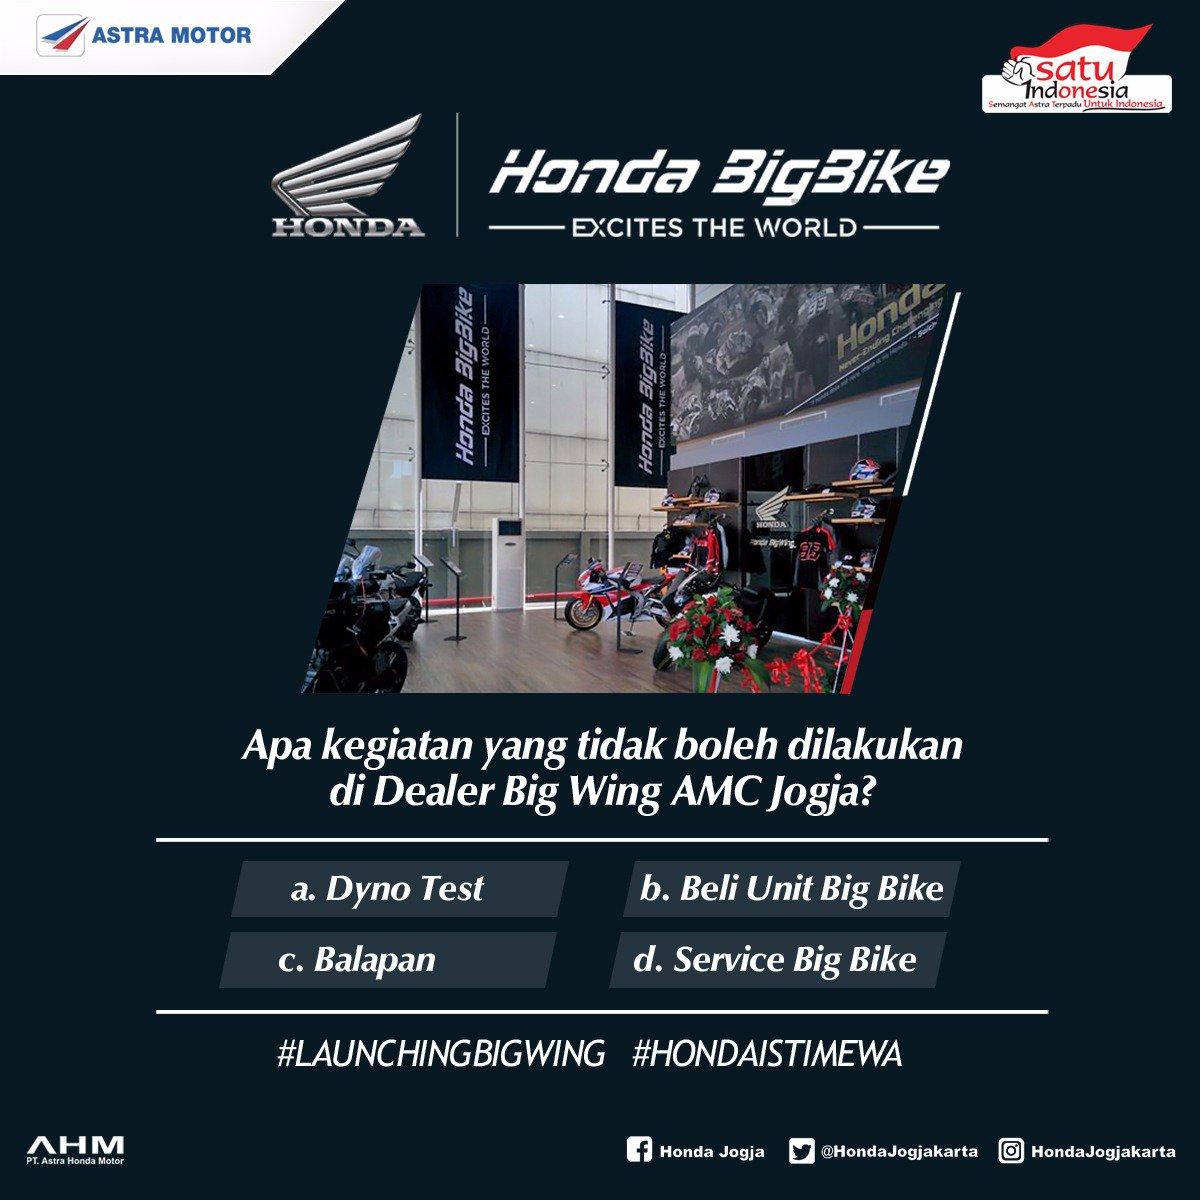 Ini kuisnya #LaunchingBIGWING #HondaIstimewa https://t.co/F9y9vn6DPy